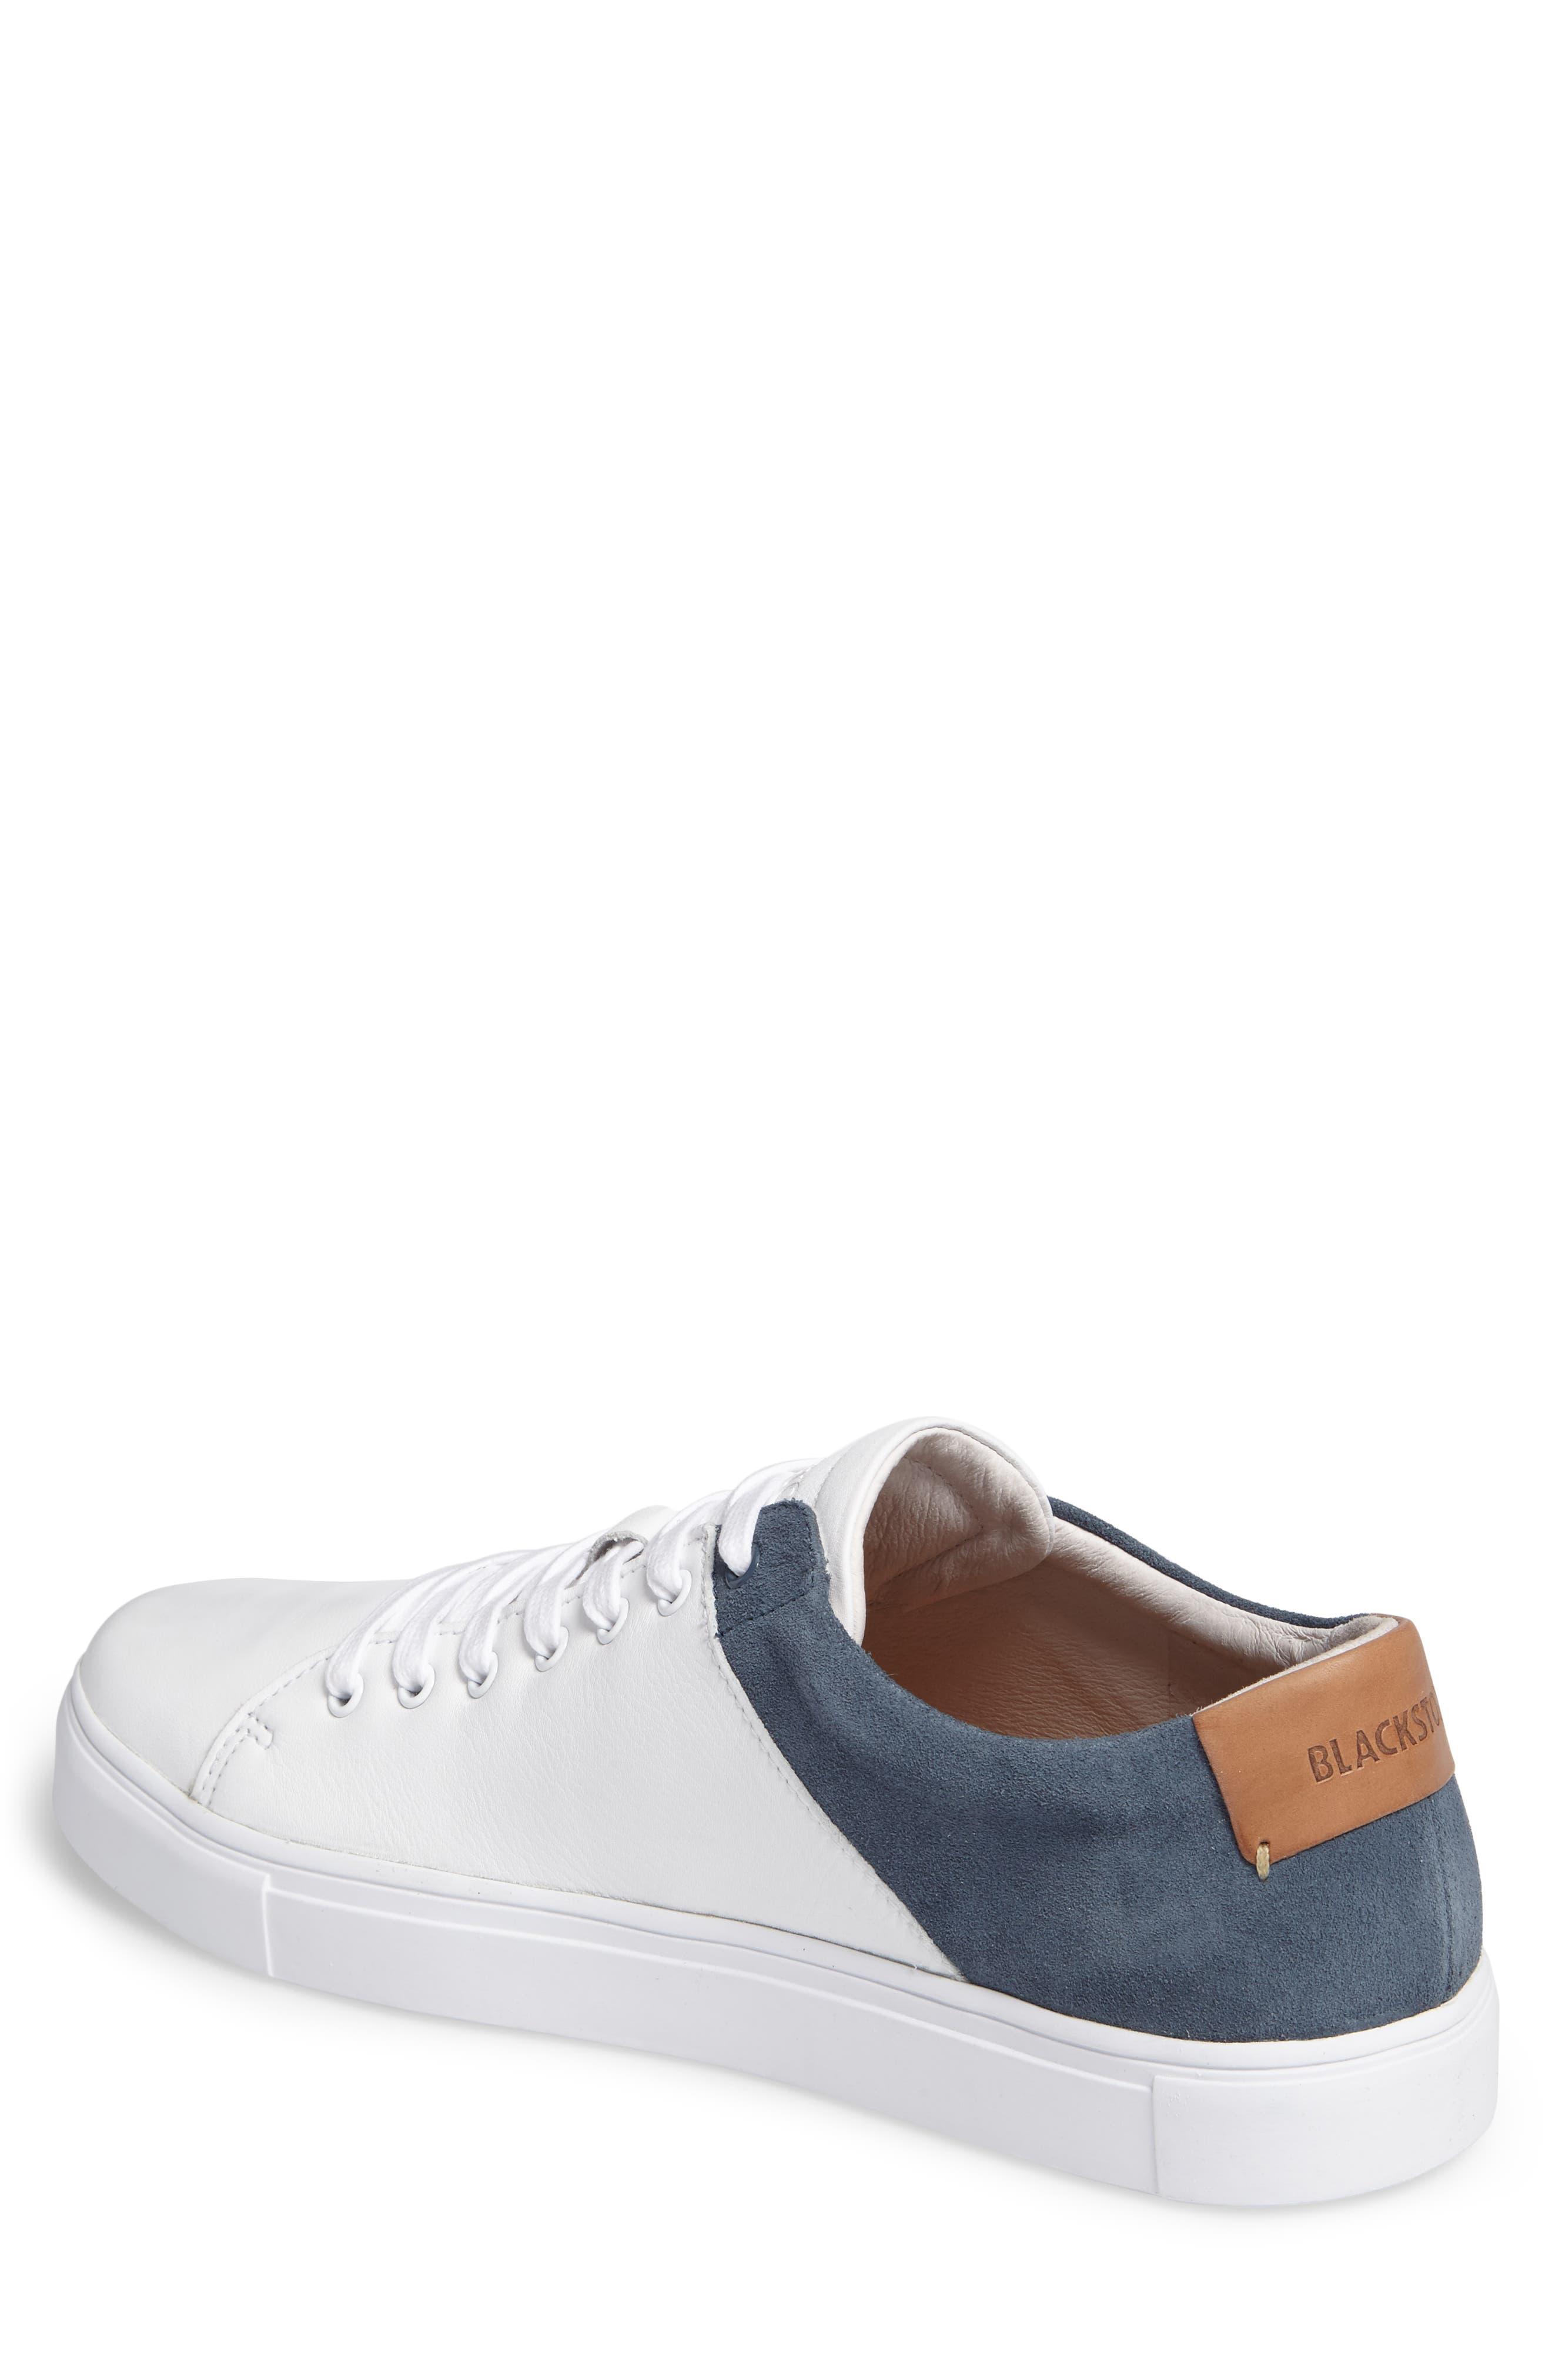 Alternate Image 2  - Blackstone NM03 Two-Tone Sneaker (Men)